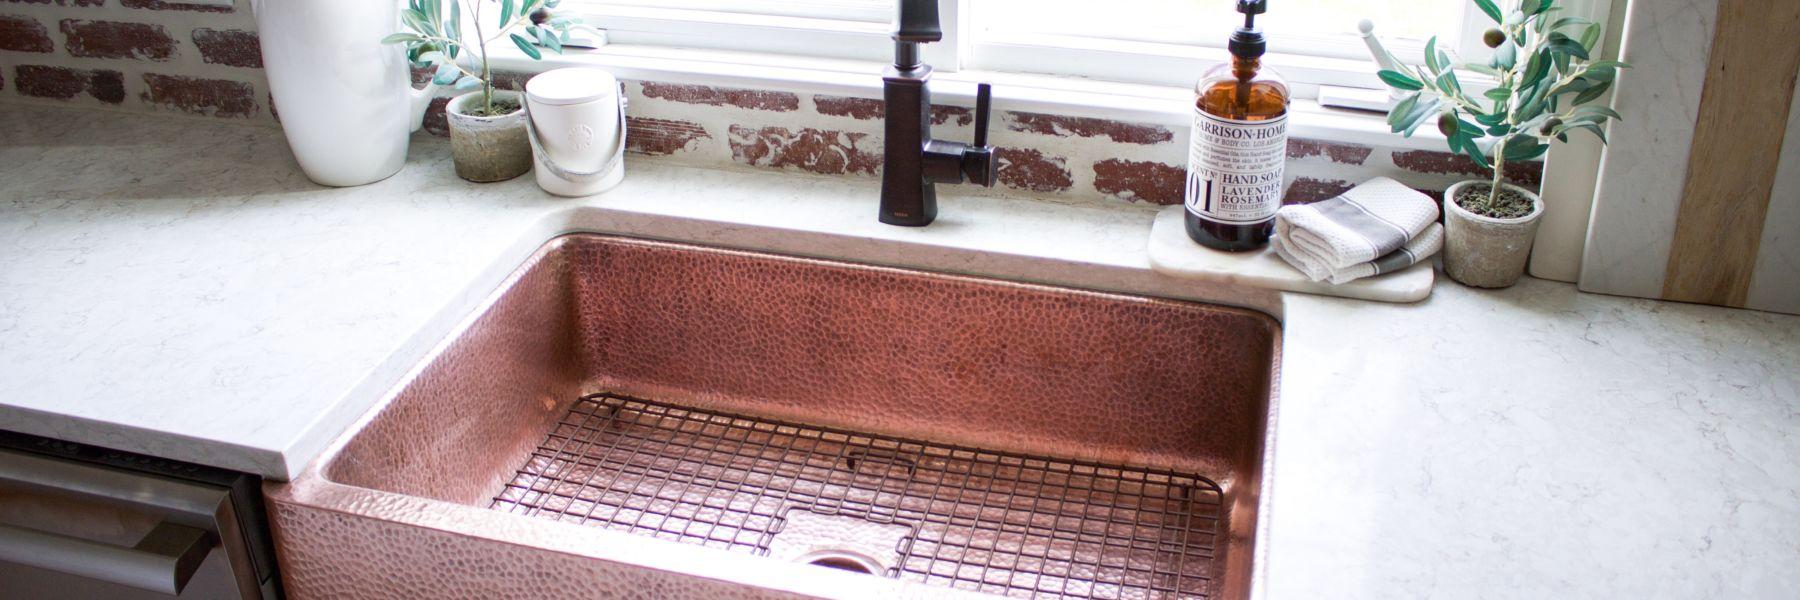 farmhouse-copper-sink